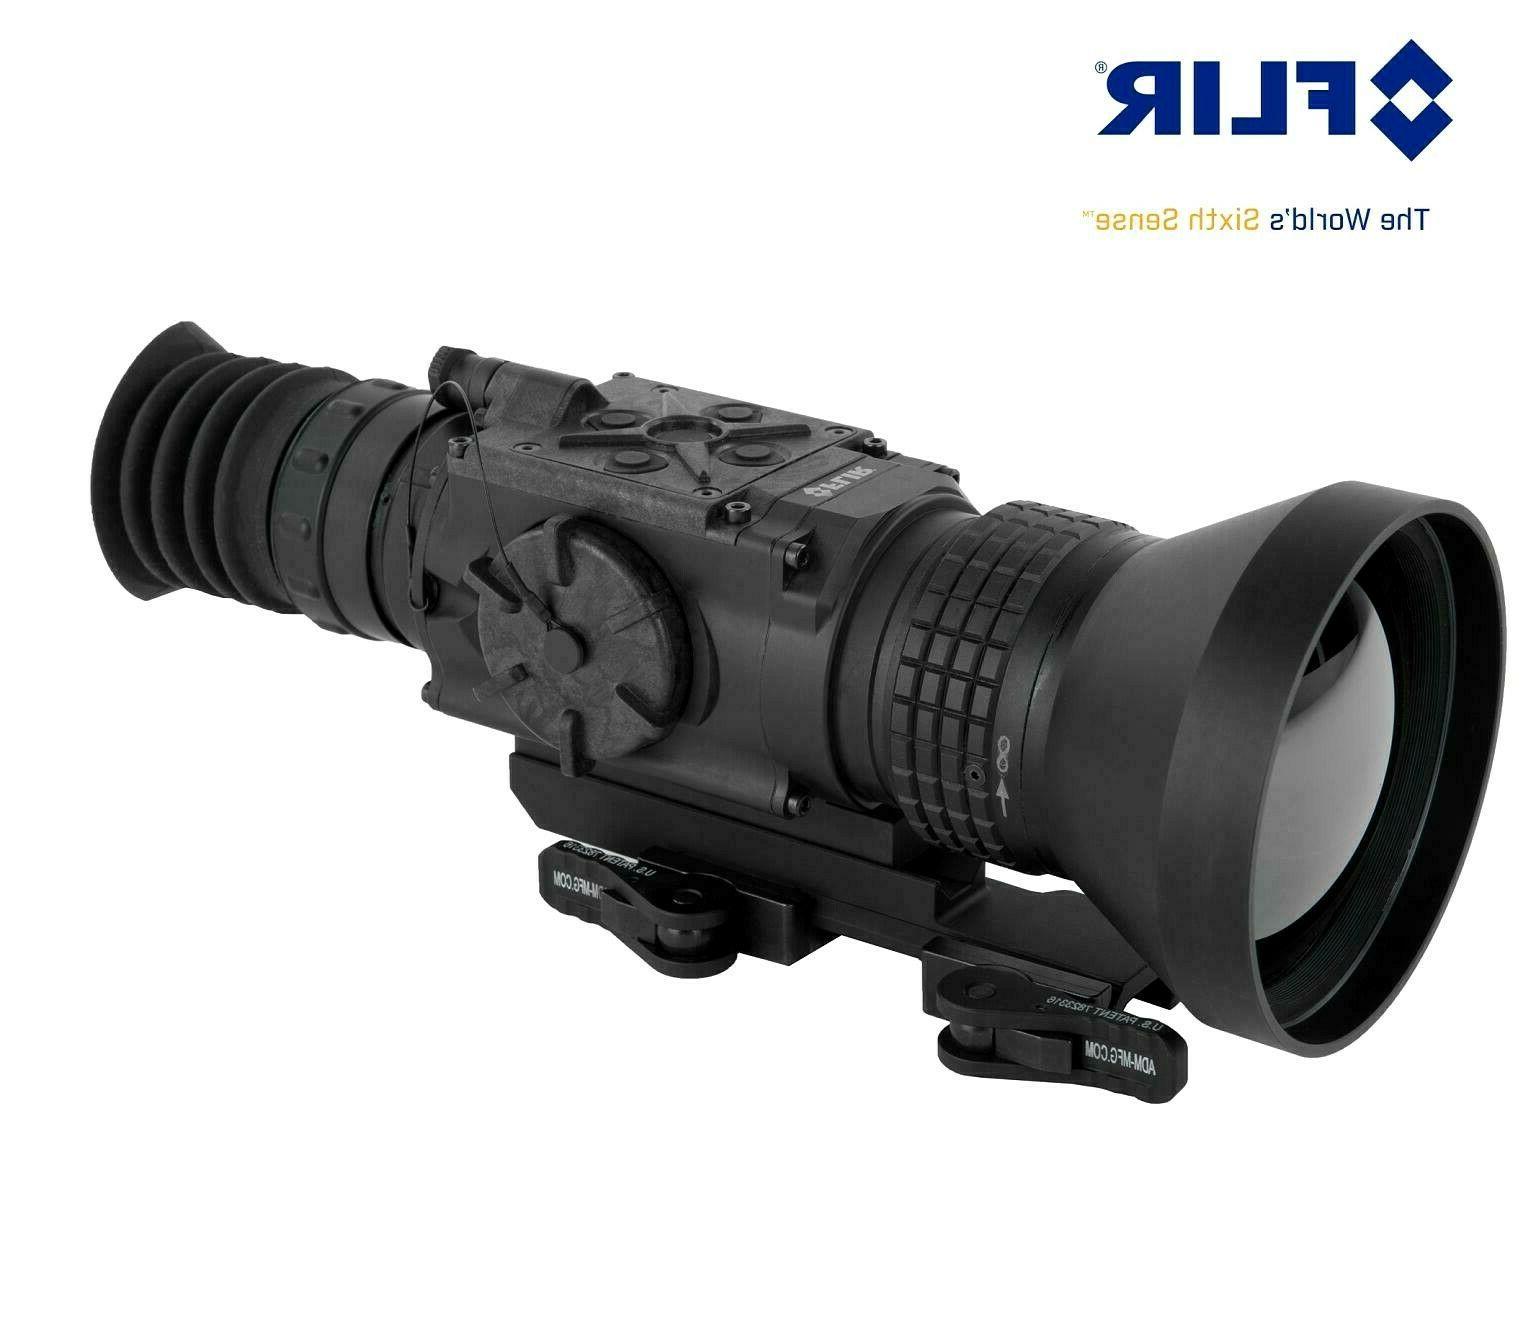 FLIR ThermoSight 6-24X75mm Optic Night Vision Scope